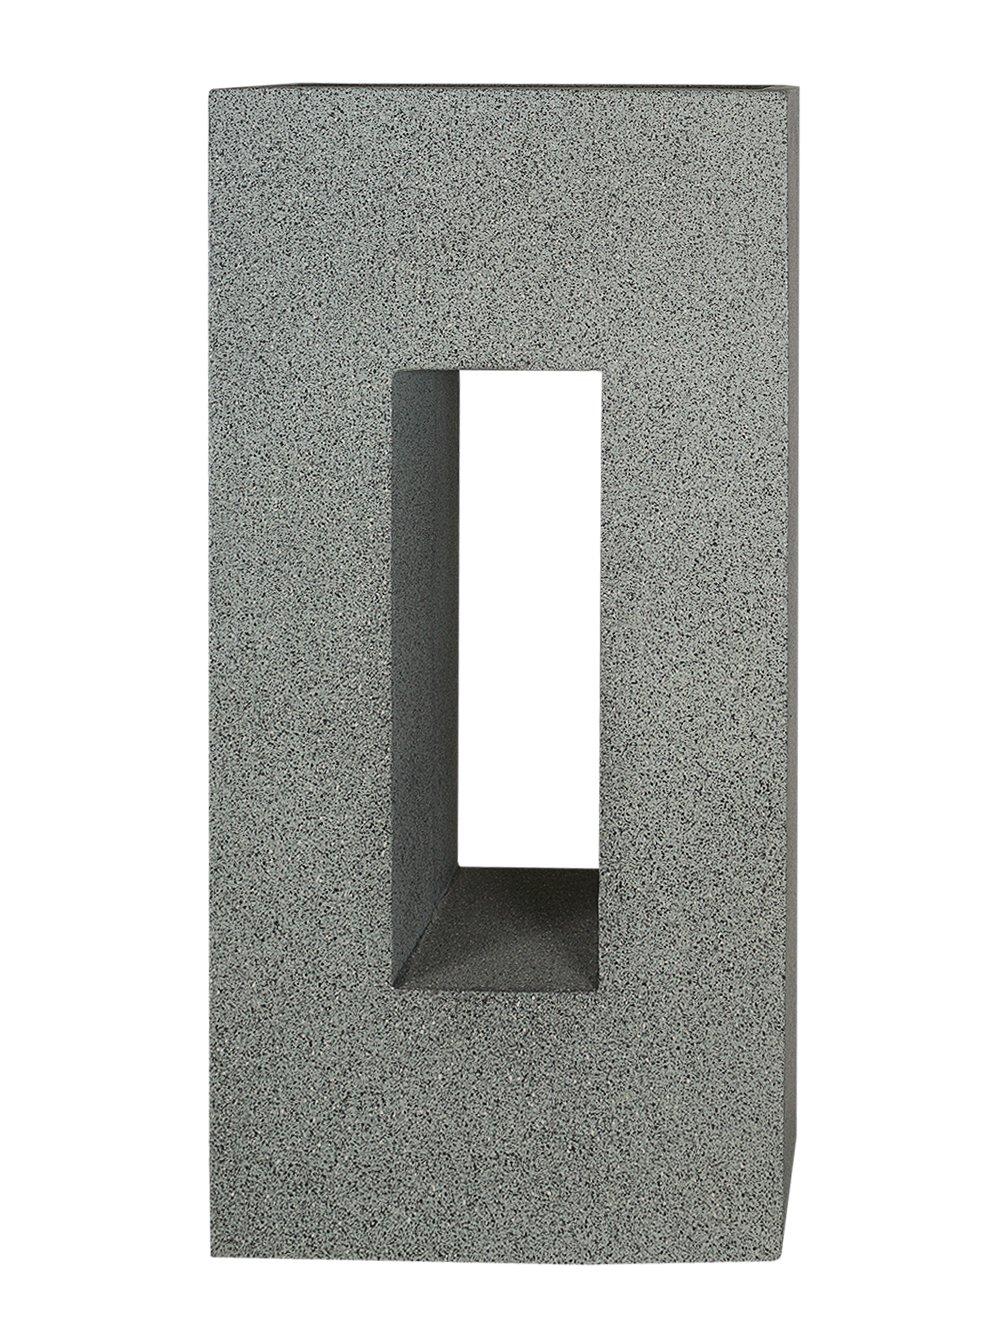 PFLANZWERK® Pflanzkübel Fiberglas VISTA Granit Grau 96x45x27cm XXL *Frostbeständig* *UV-Schutz* *Qualitätsware*